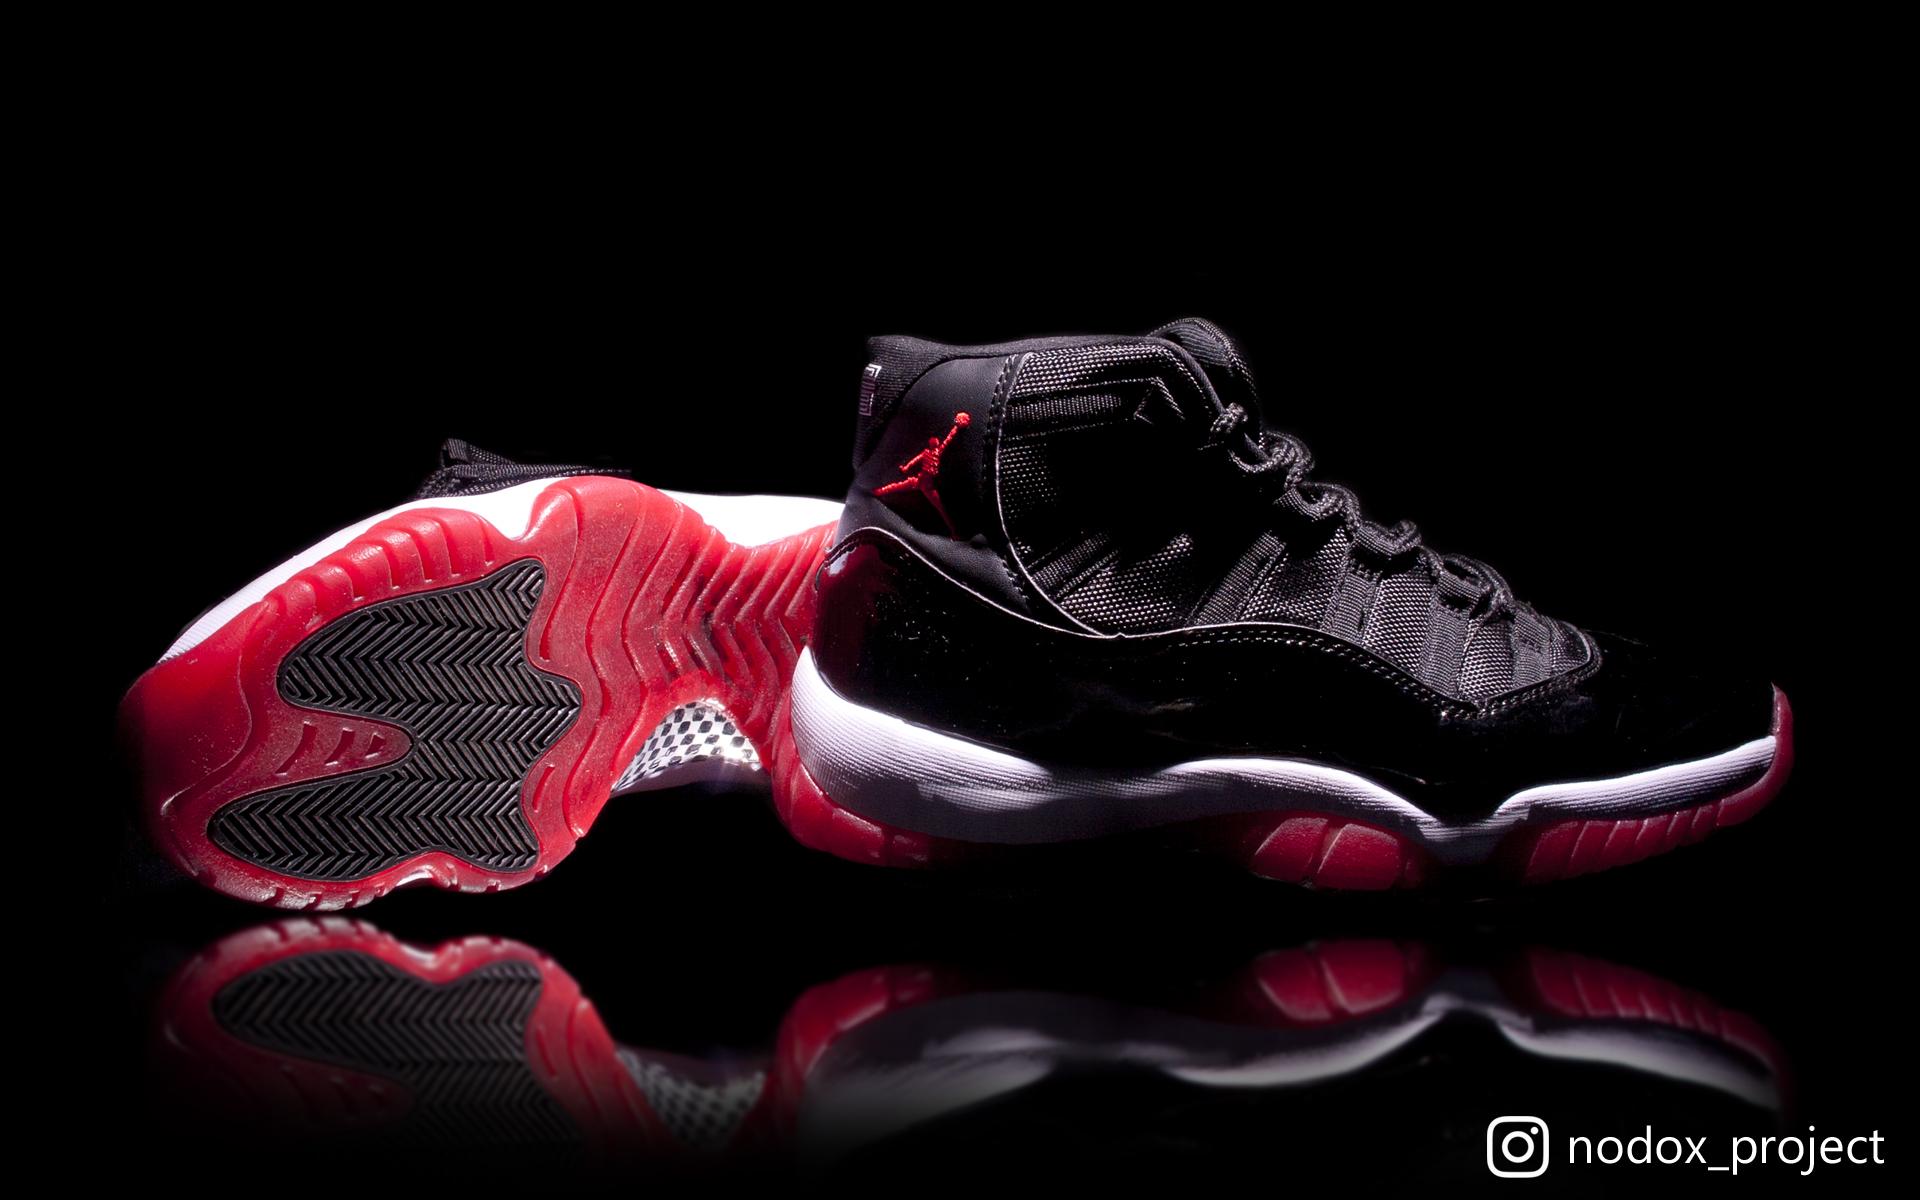 Repulsión Por separado Tutor  Wallpaper : jordan, tenis, Air Jordan, deportes, zapatos, logo, negro  1920x1200 - kormin - 1546279 - HD Wallpapers - WallHere